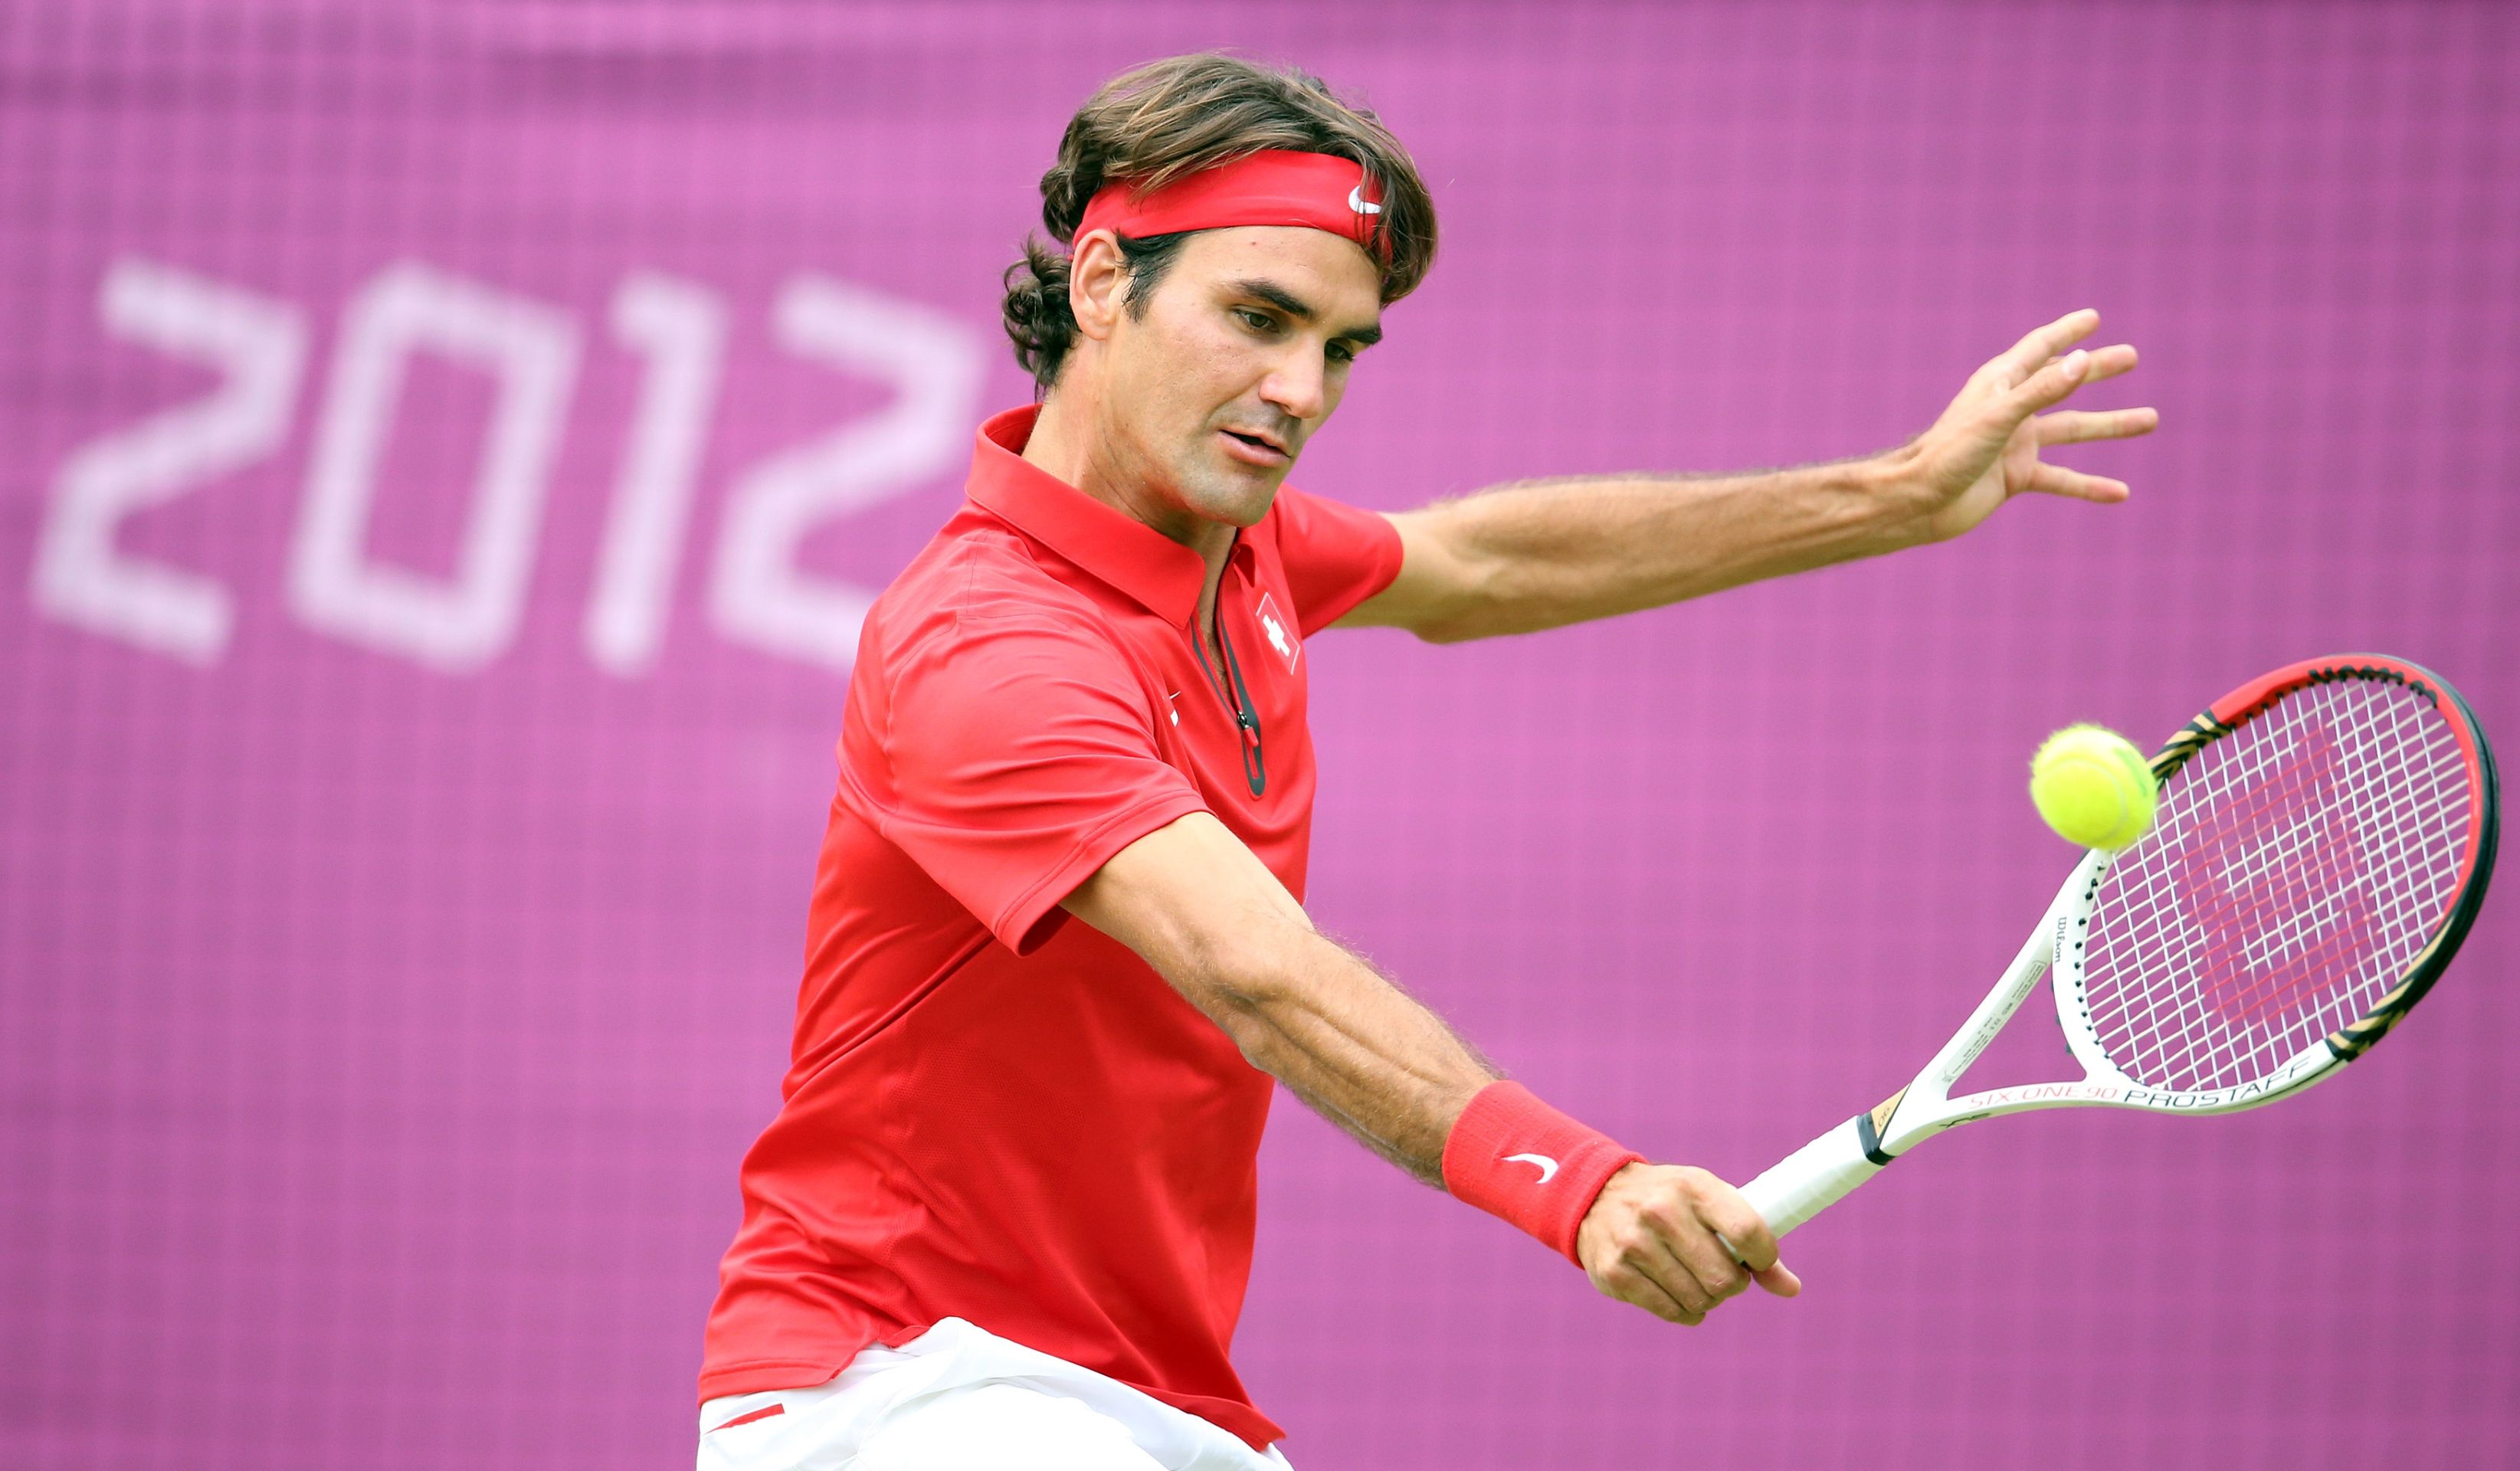 ATP INDIAN WELLS Federer u polufinalu bez borbe